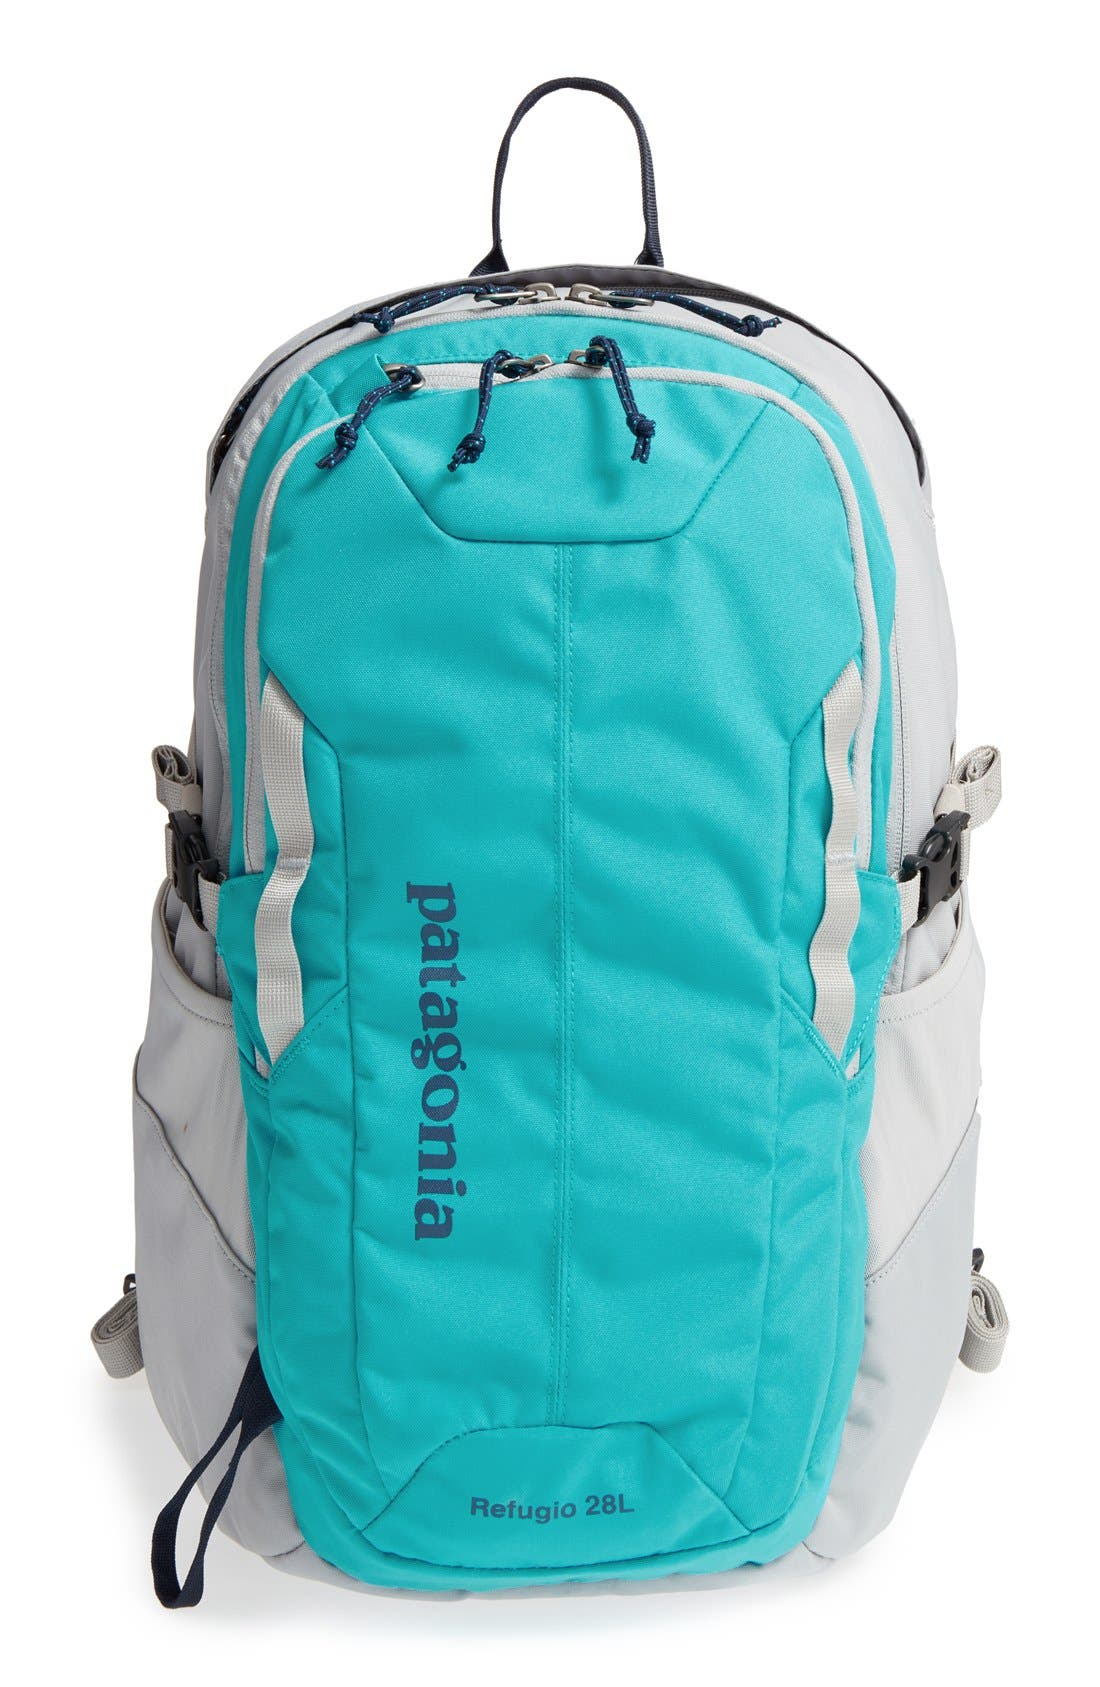 Main Image - Patagonia 'Refugio 28L' Backpack